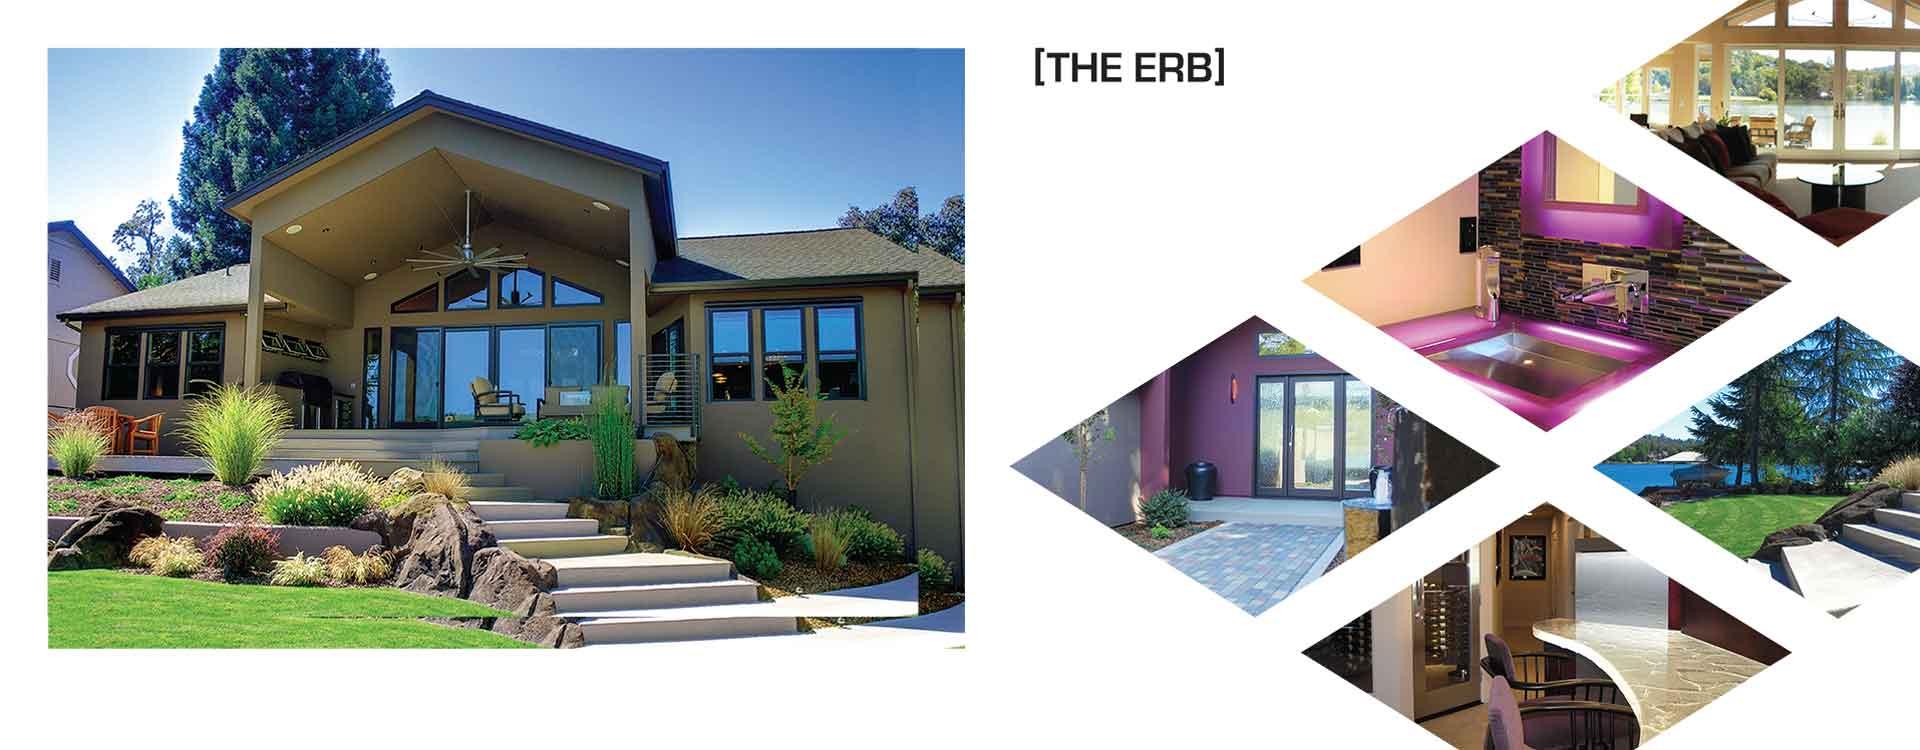 Len-Stevens-Construction-Grass-Valley-The-Erb-Home